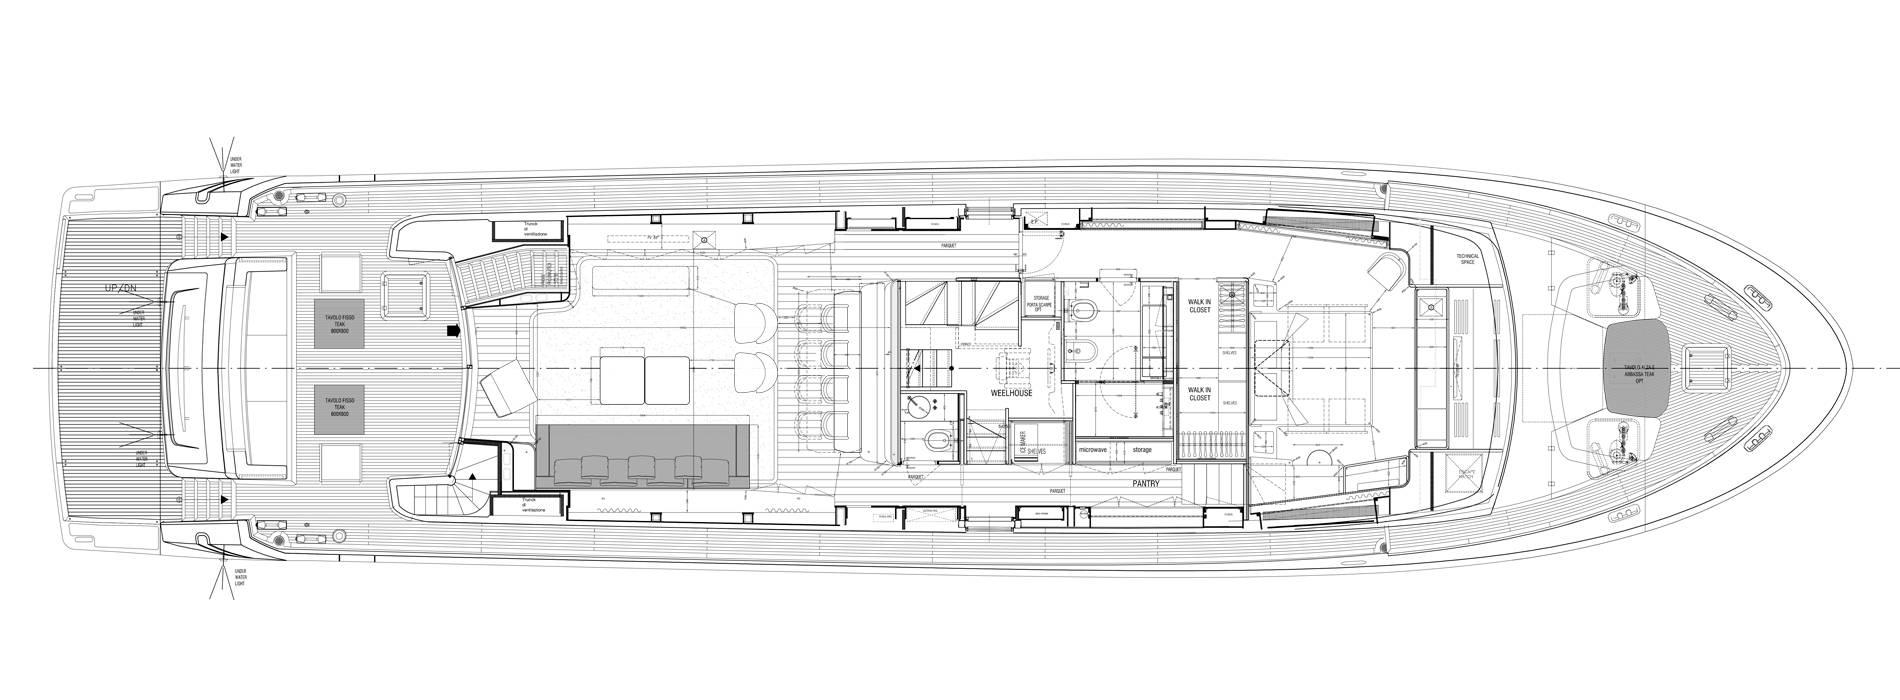 Sanlorenzo Yachts SL96-635 Cubierta principal